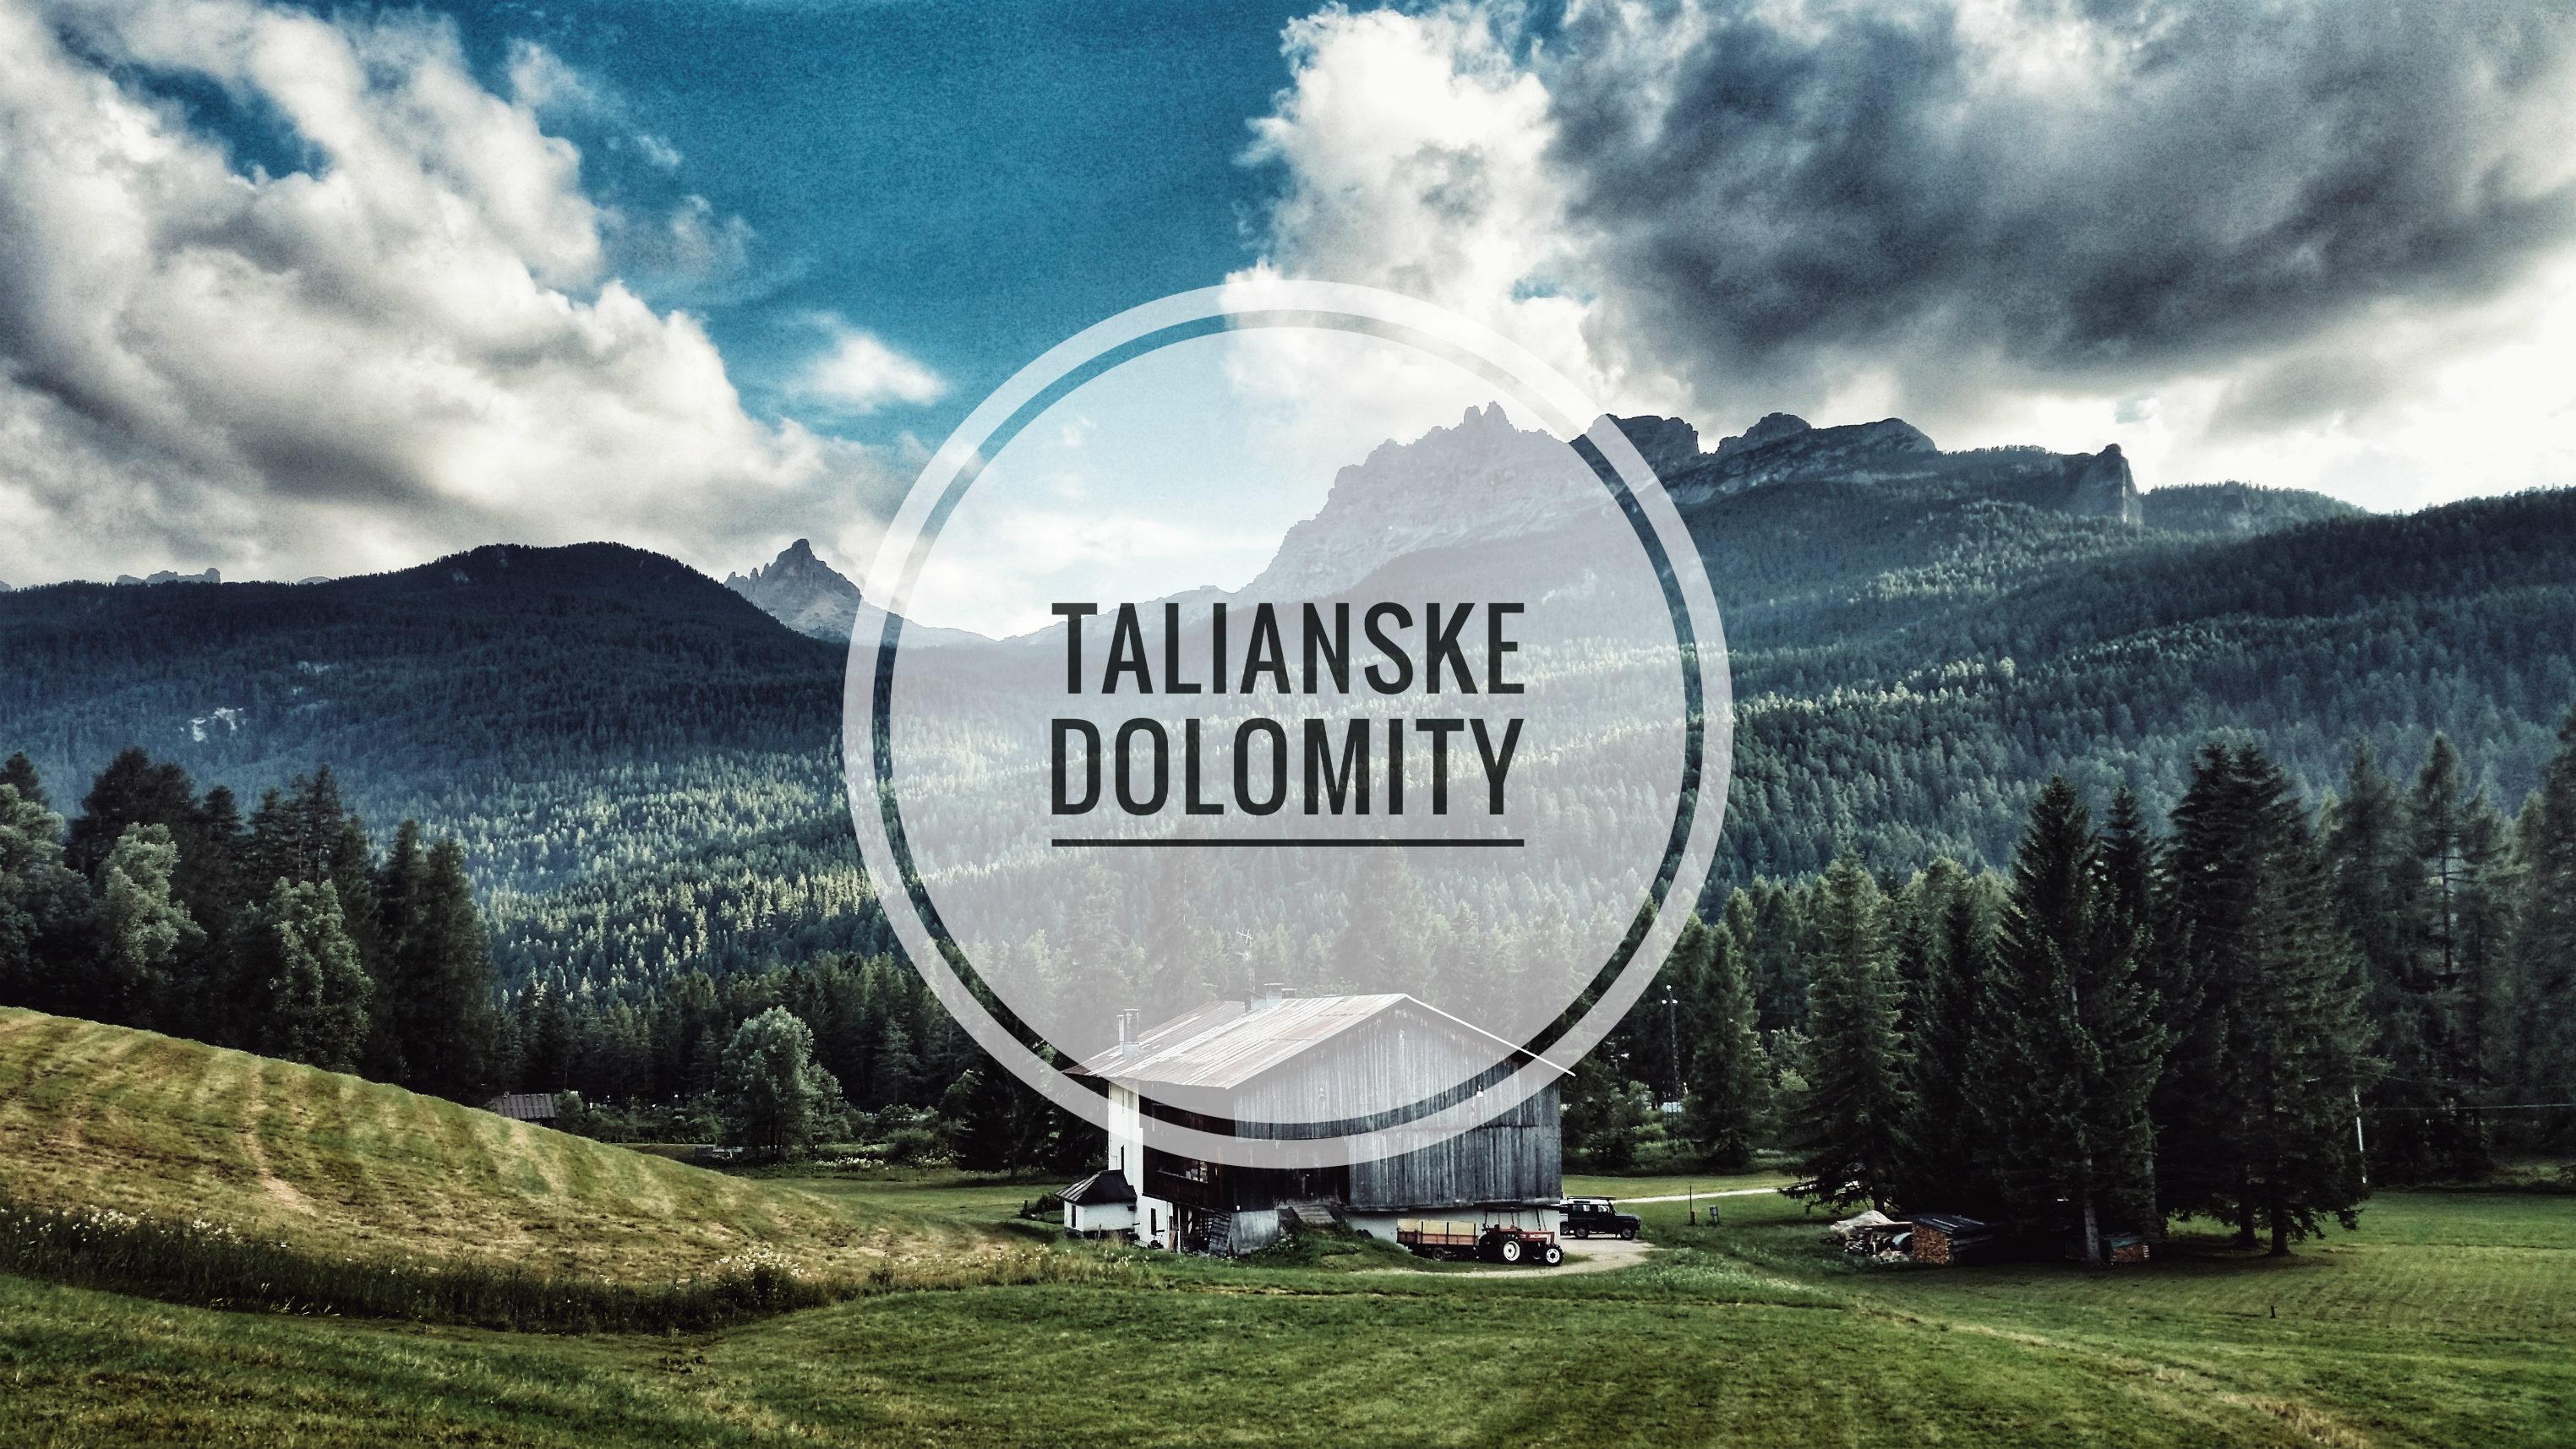 dolomity-taliansko-cortina-ampezzo